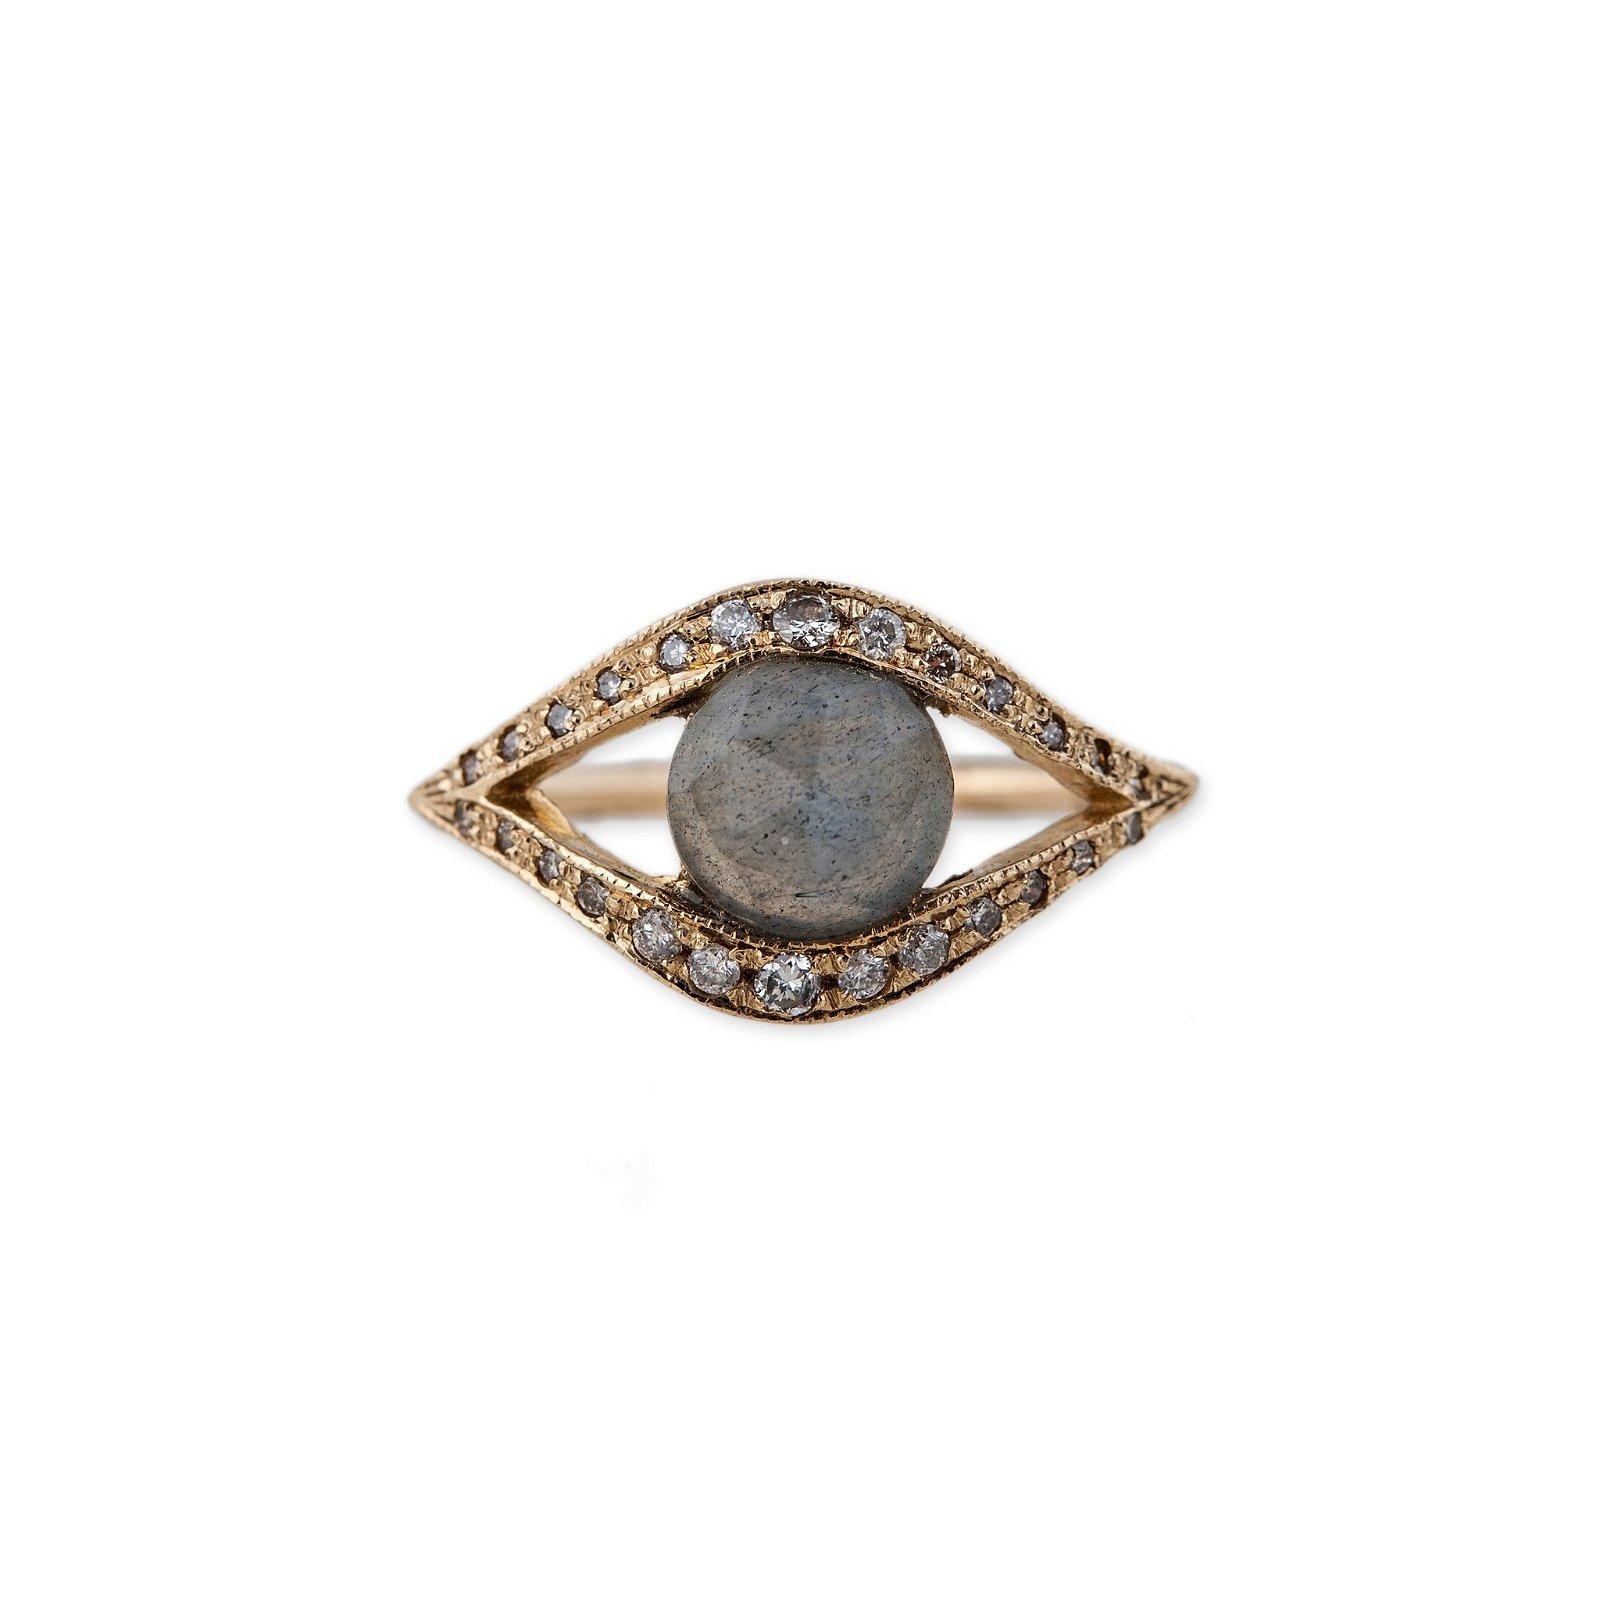 Image of Pave Diamond Gemstone Center Eye Ring